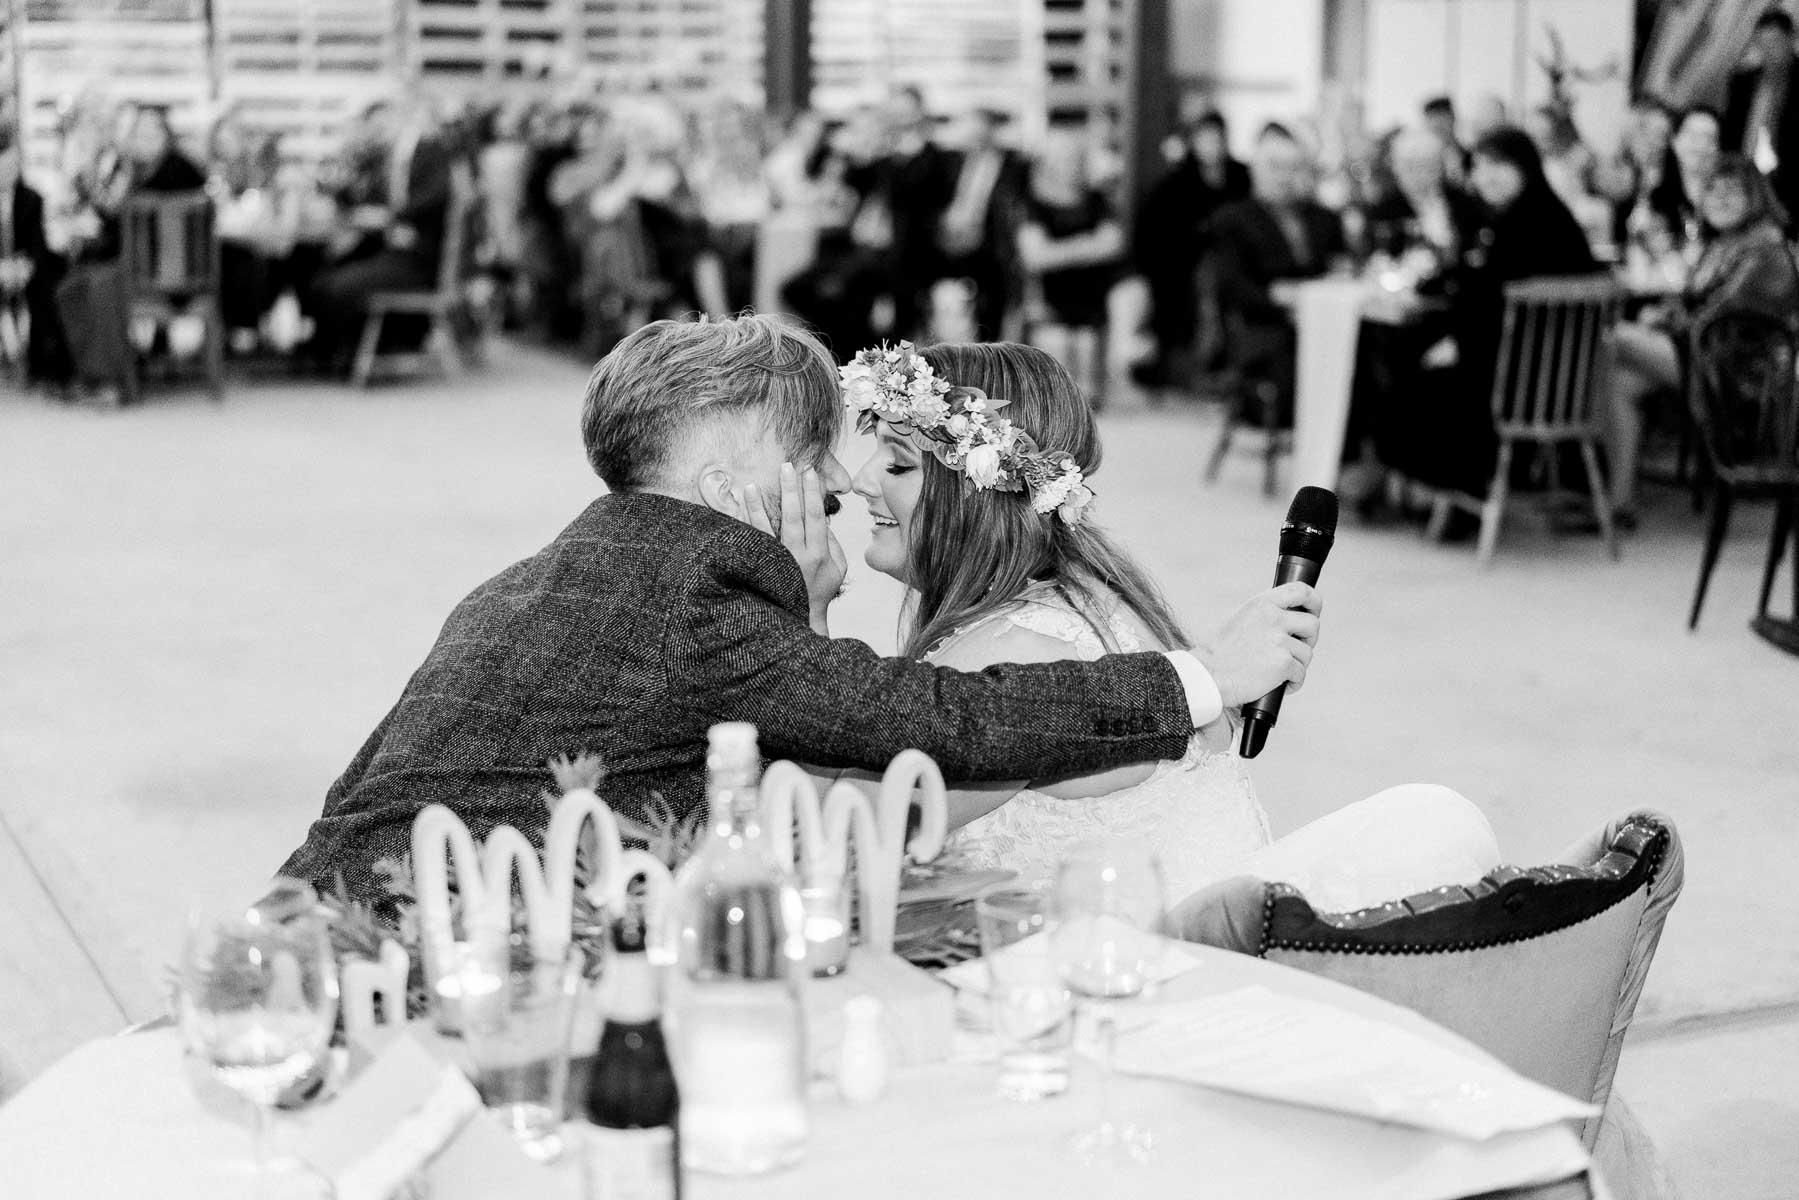 adams-farm-coldstream-yarra-valley-wedding-heart+soul-weddings-kel-jarryd-06299.jpg